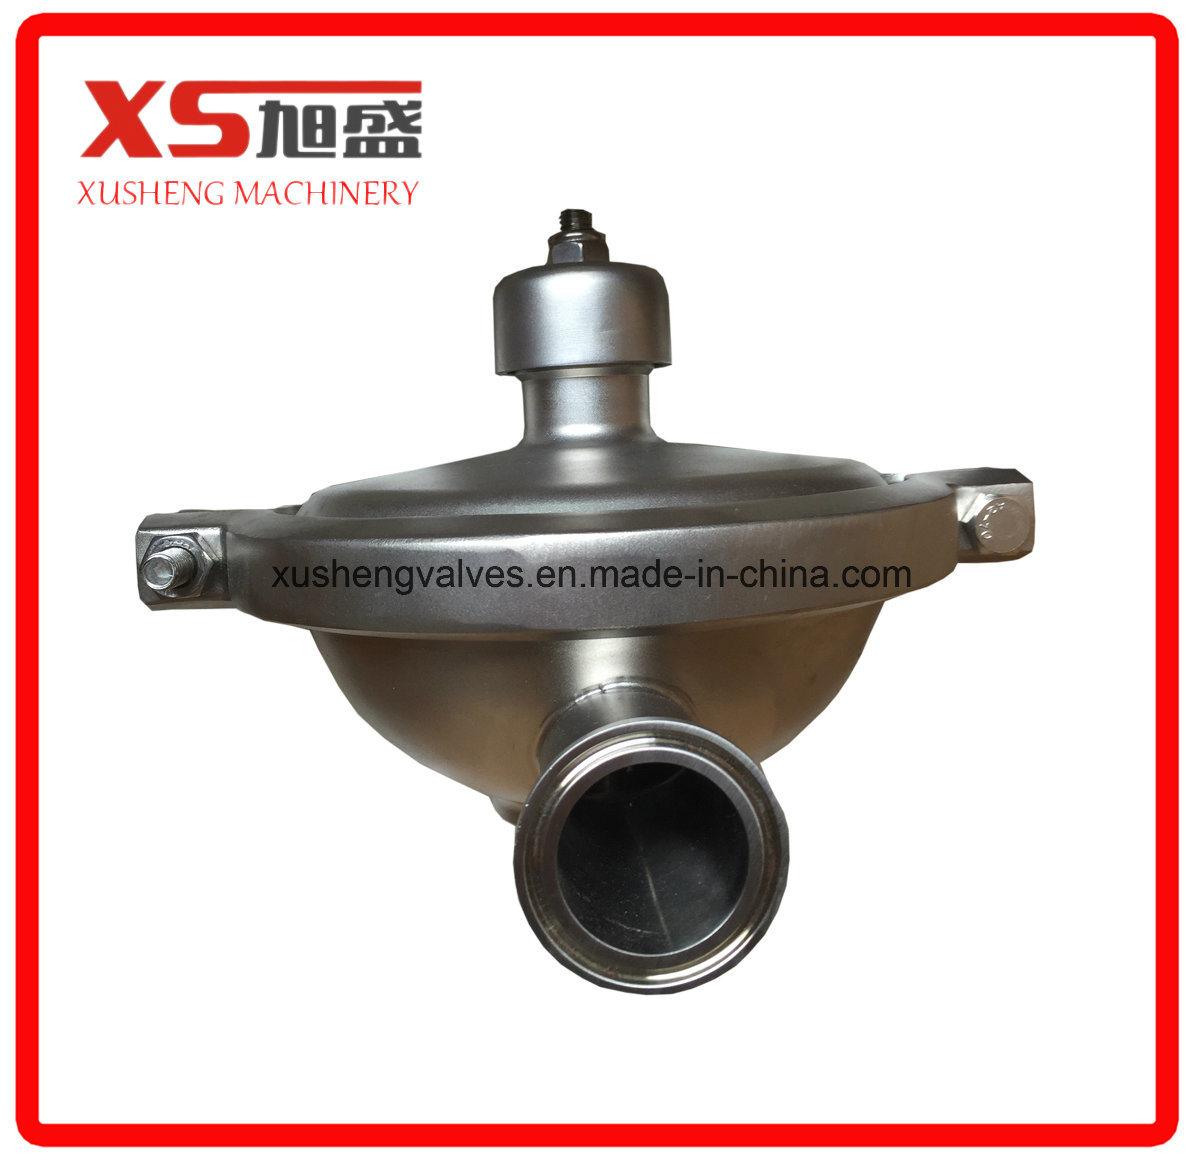 Stainless Steel Sanitary Grade Pressure Regulating Valve